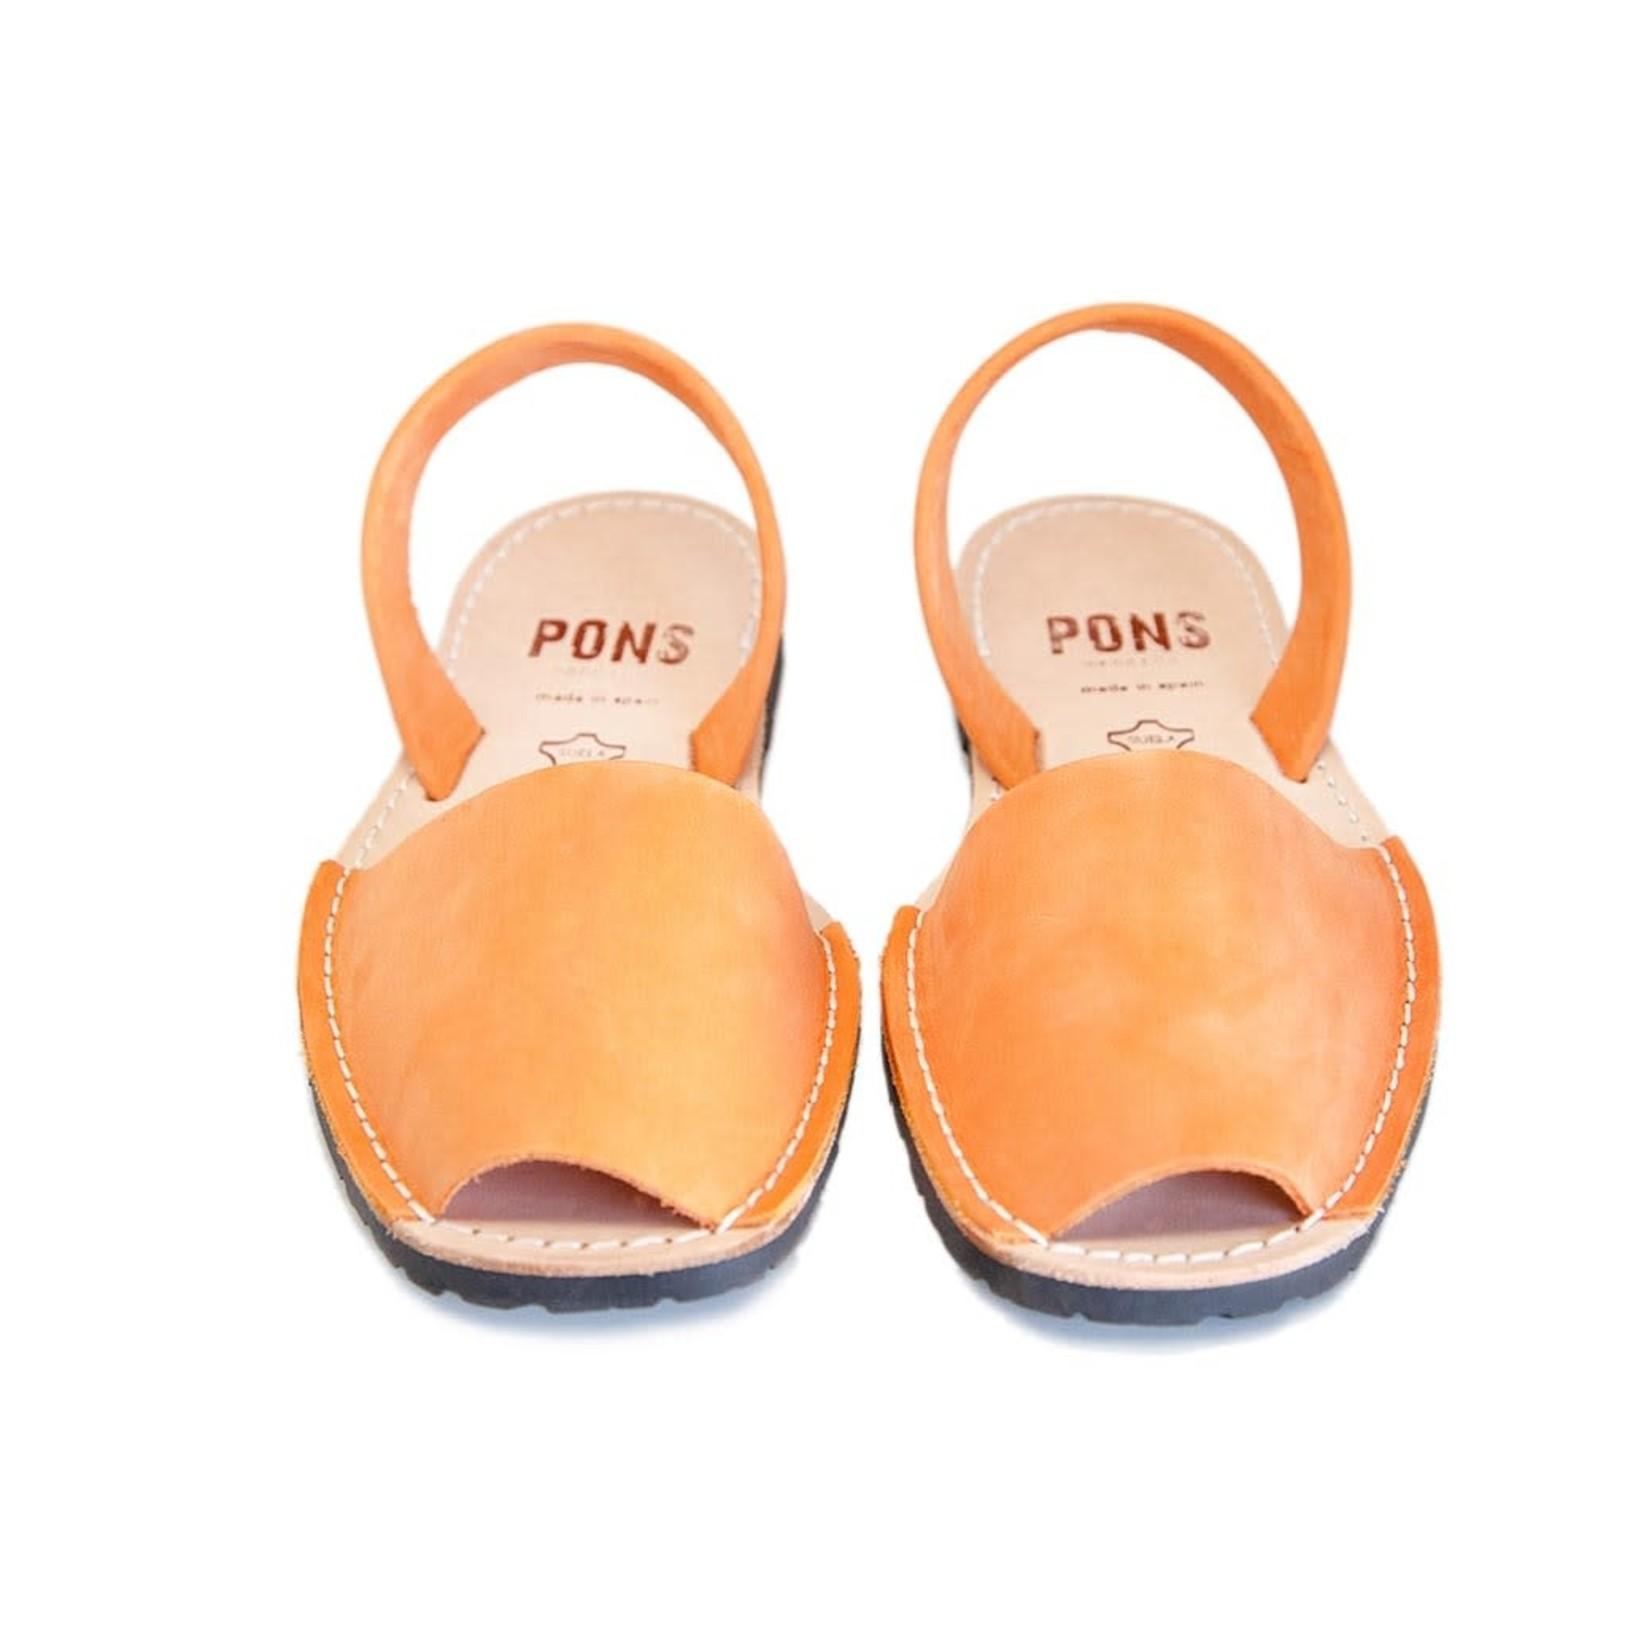 Pons Avarcas Pons Peach